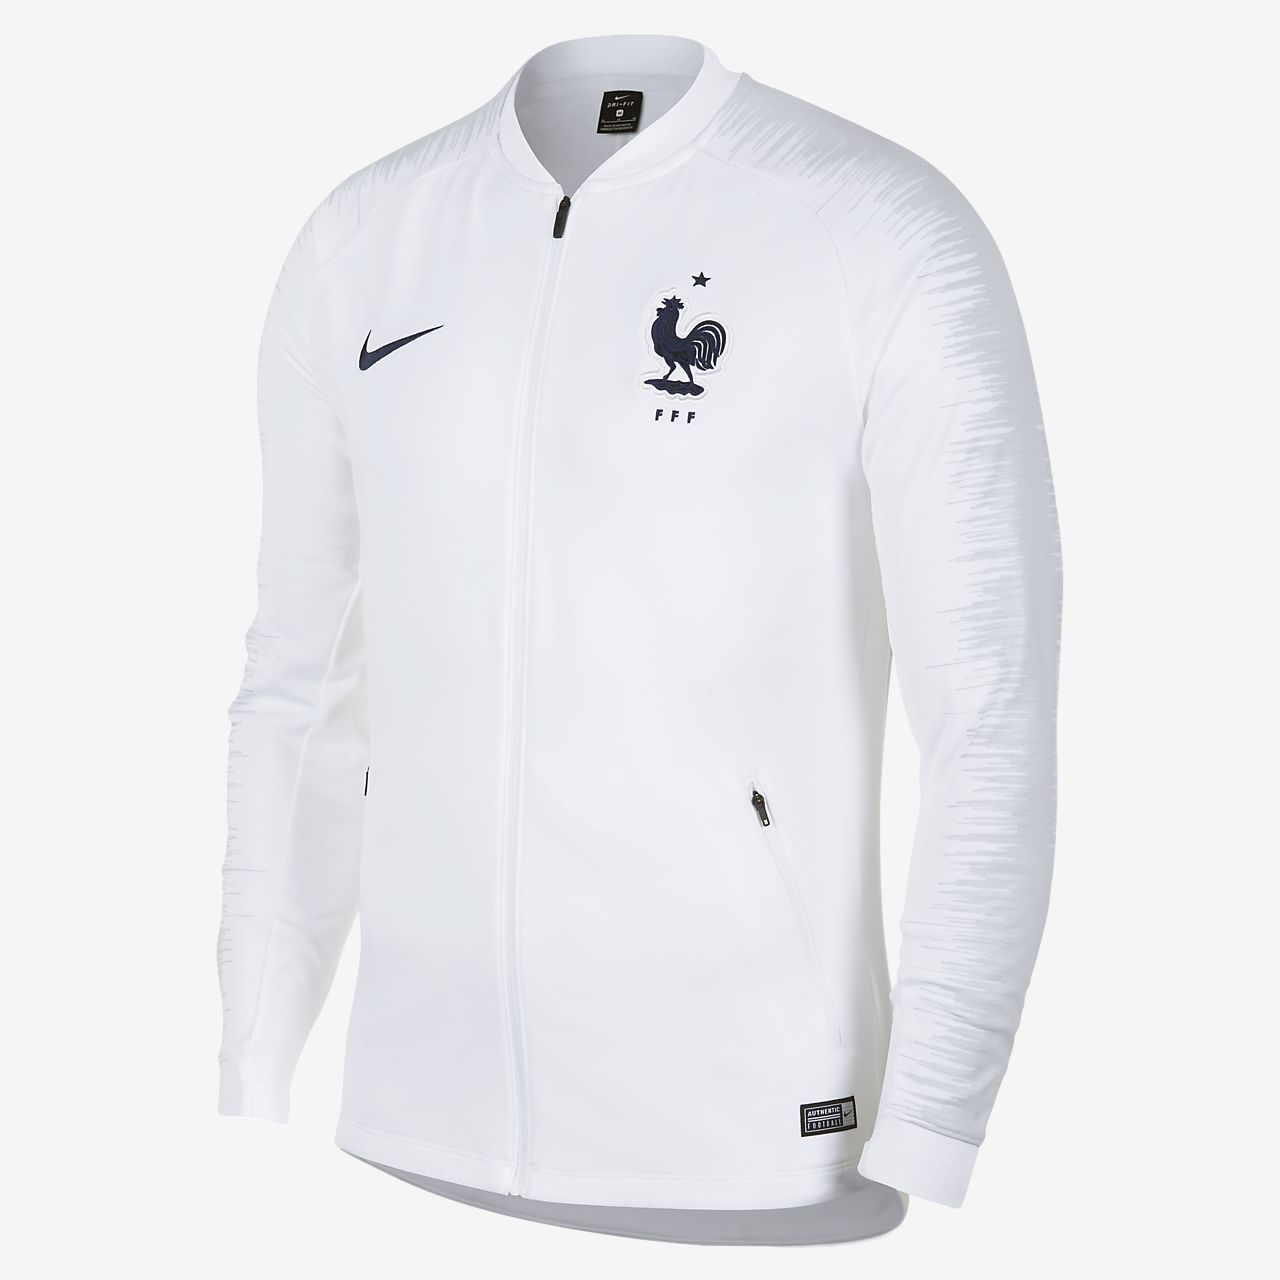 1ff5647bf5989 Men s Football Jacket. FFF Anthem